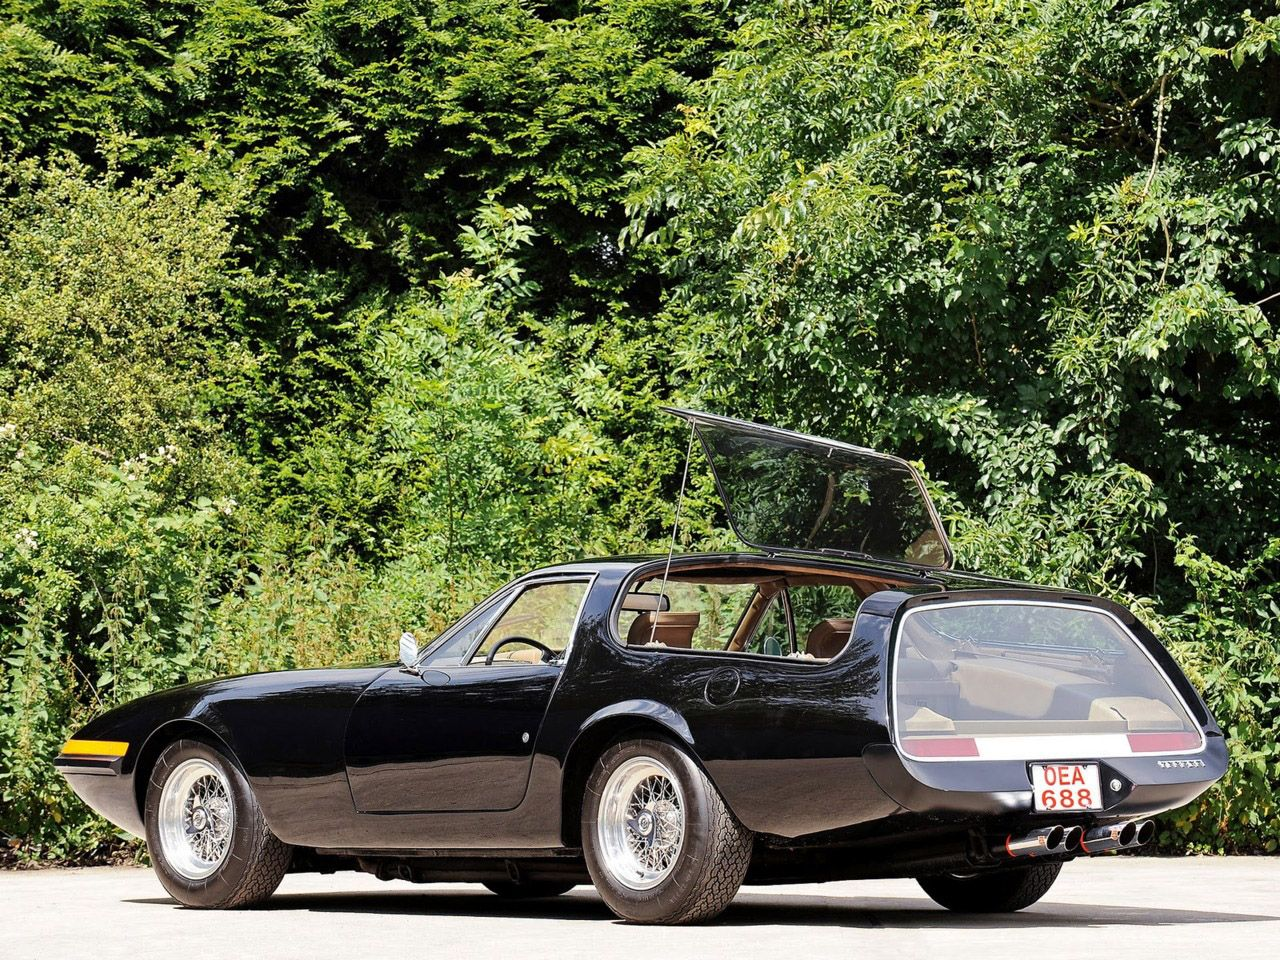 1974 panther ferrari 365 gtb 4 daytona shooting brake created by panther westwinds of byfleet